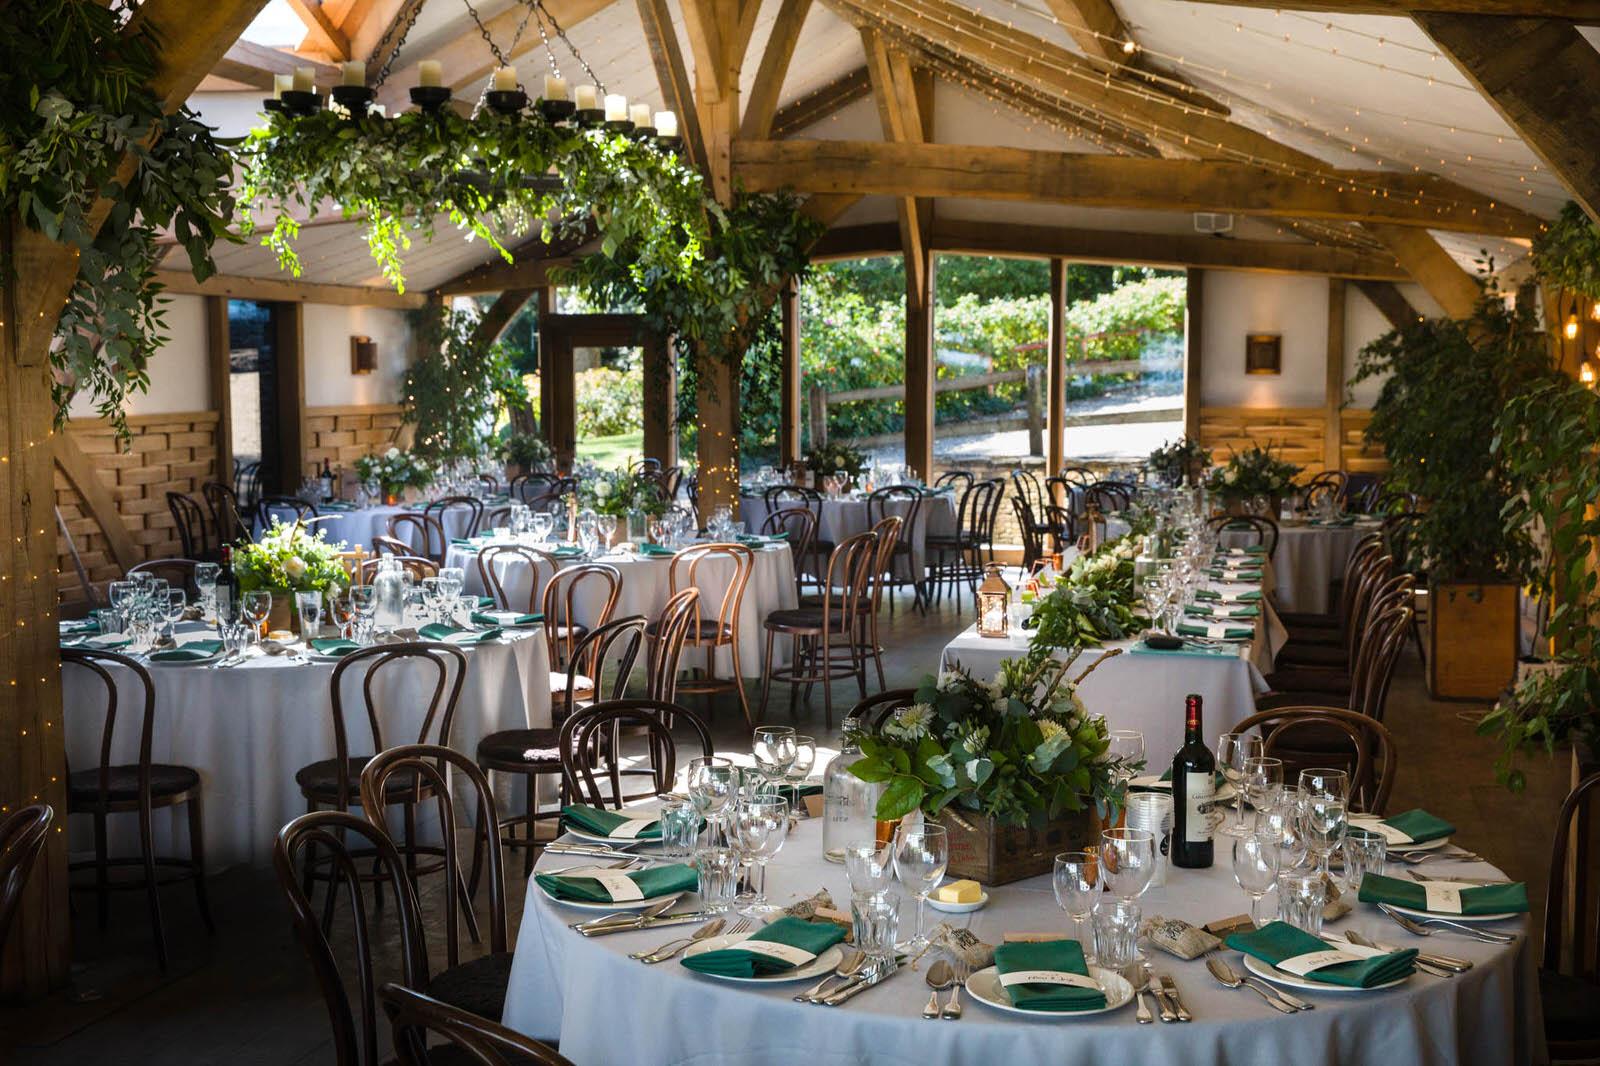 10.8.18Chris Giles - Claire and Josh - Cripps Barn-7cripps+barn+gloucestershire+wedding+venue.jpg